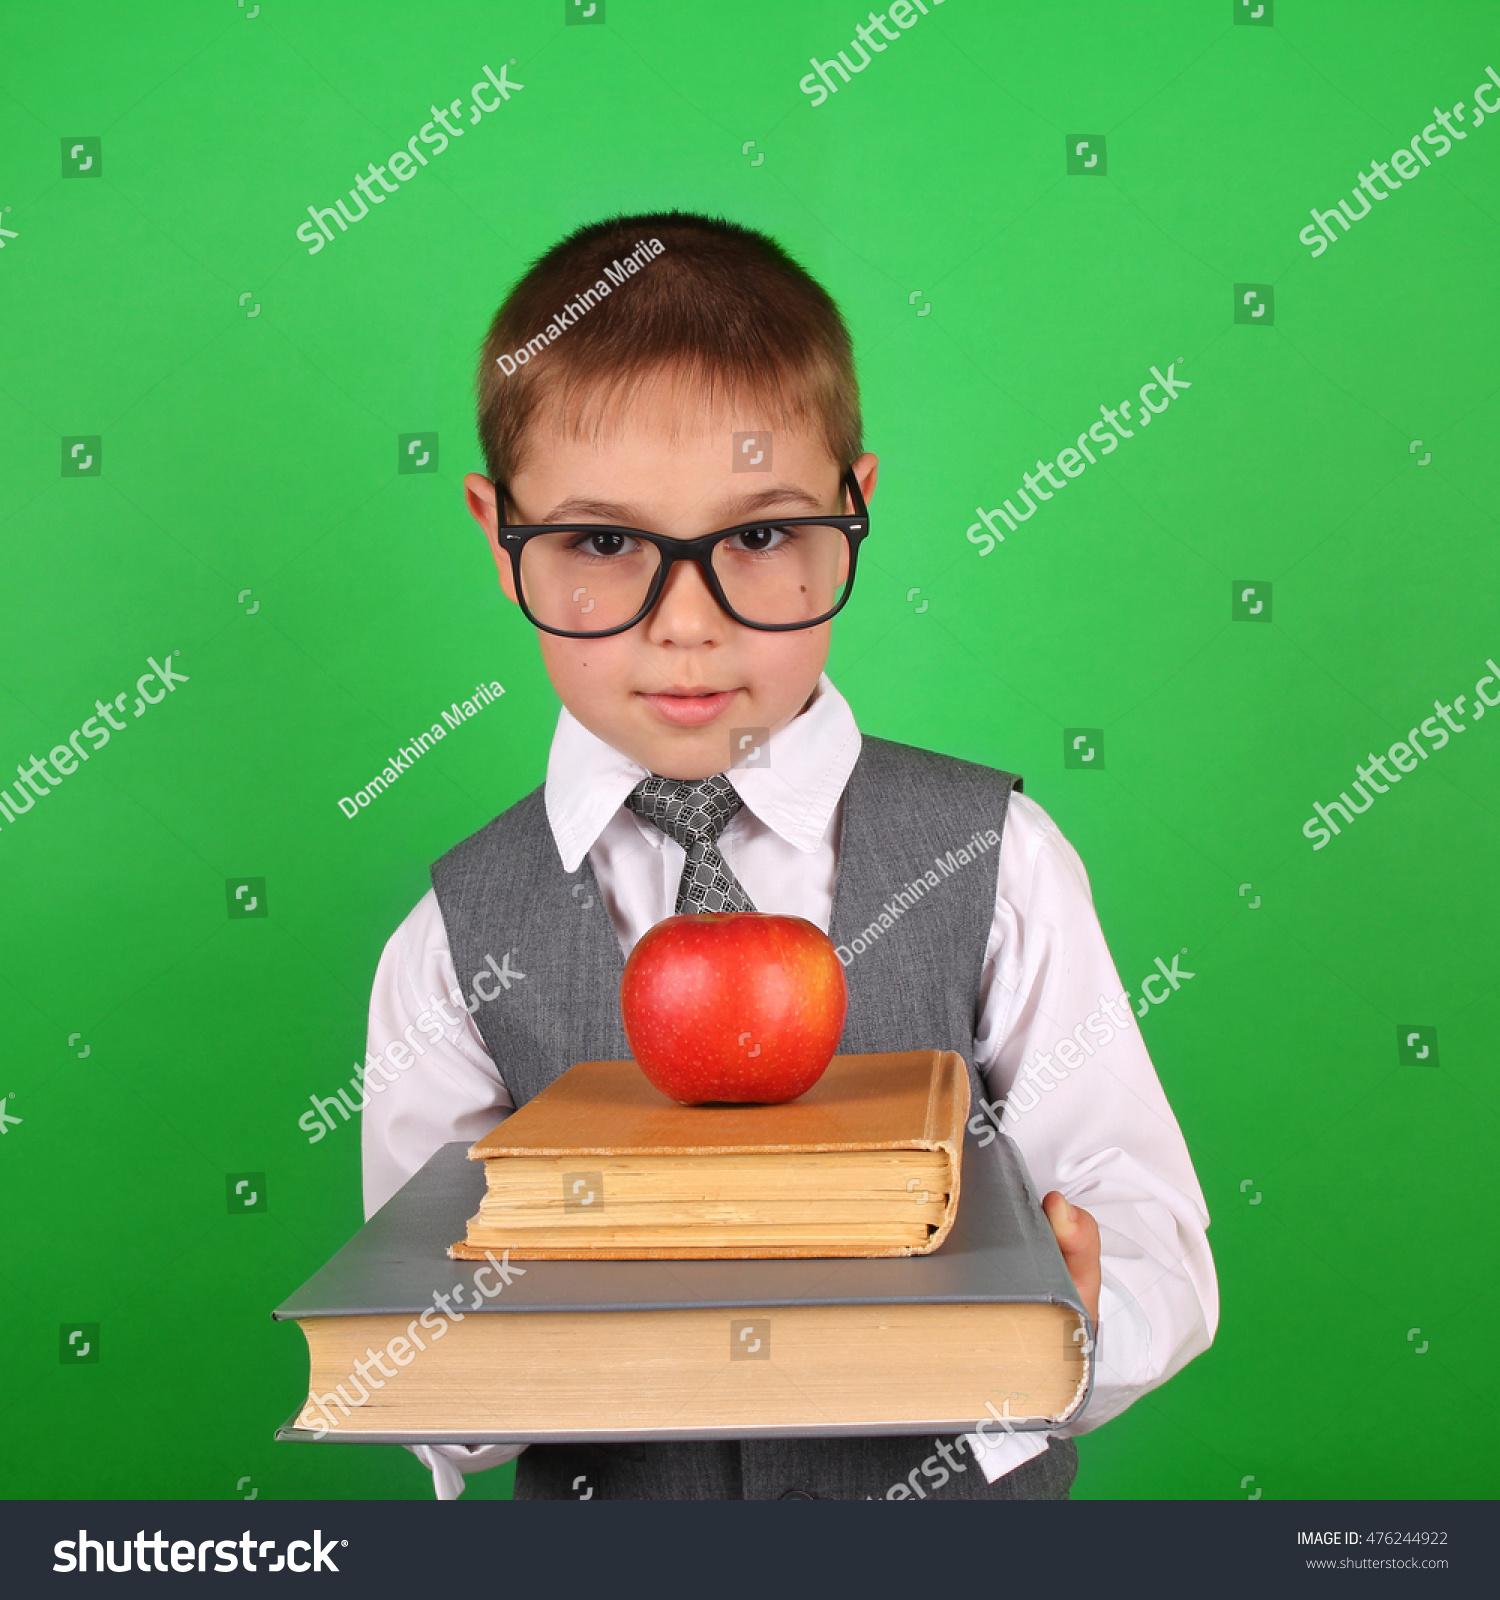 Book School Kid School Boy Classroom Stock Photo & Image (Royalty ...